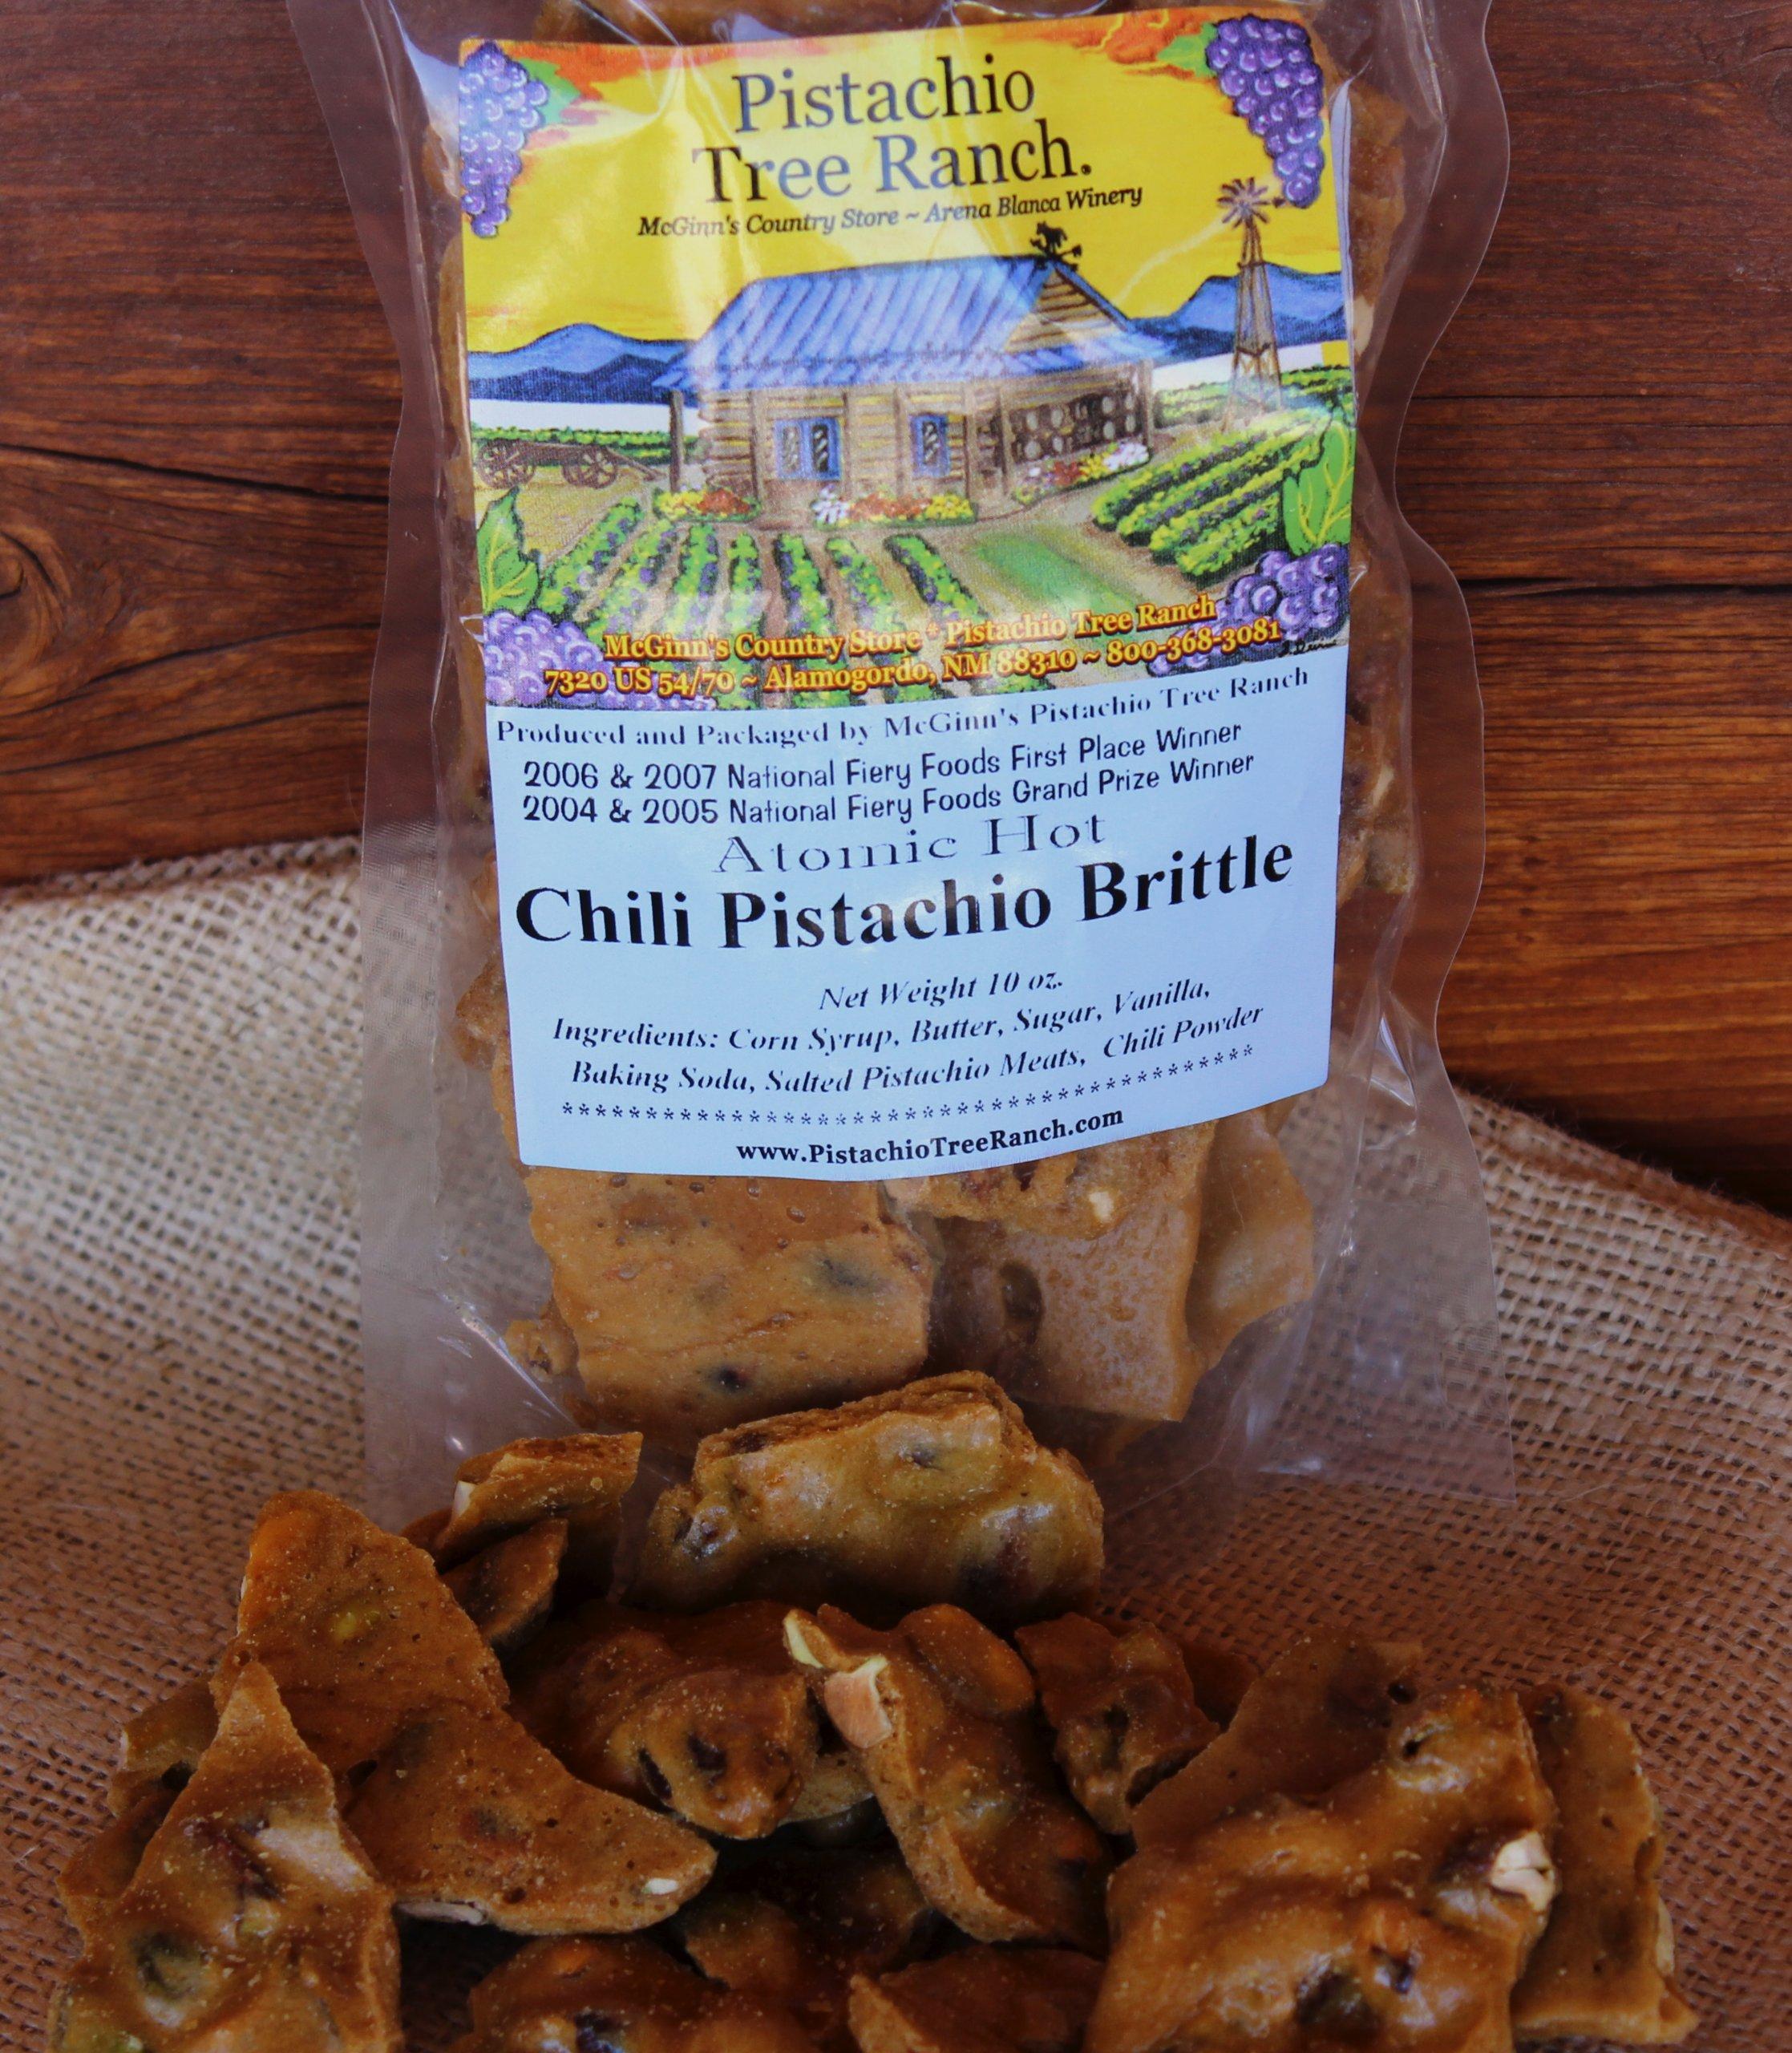 Atomic Hot Chili Pistachio Brittle